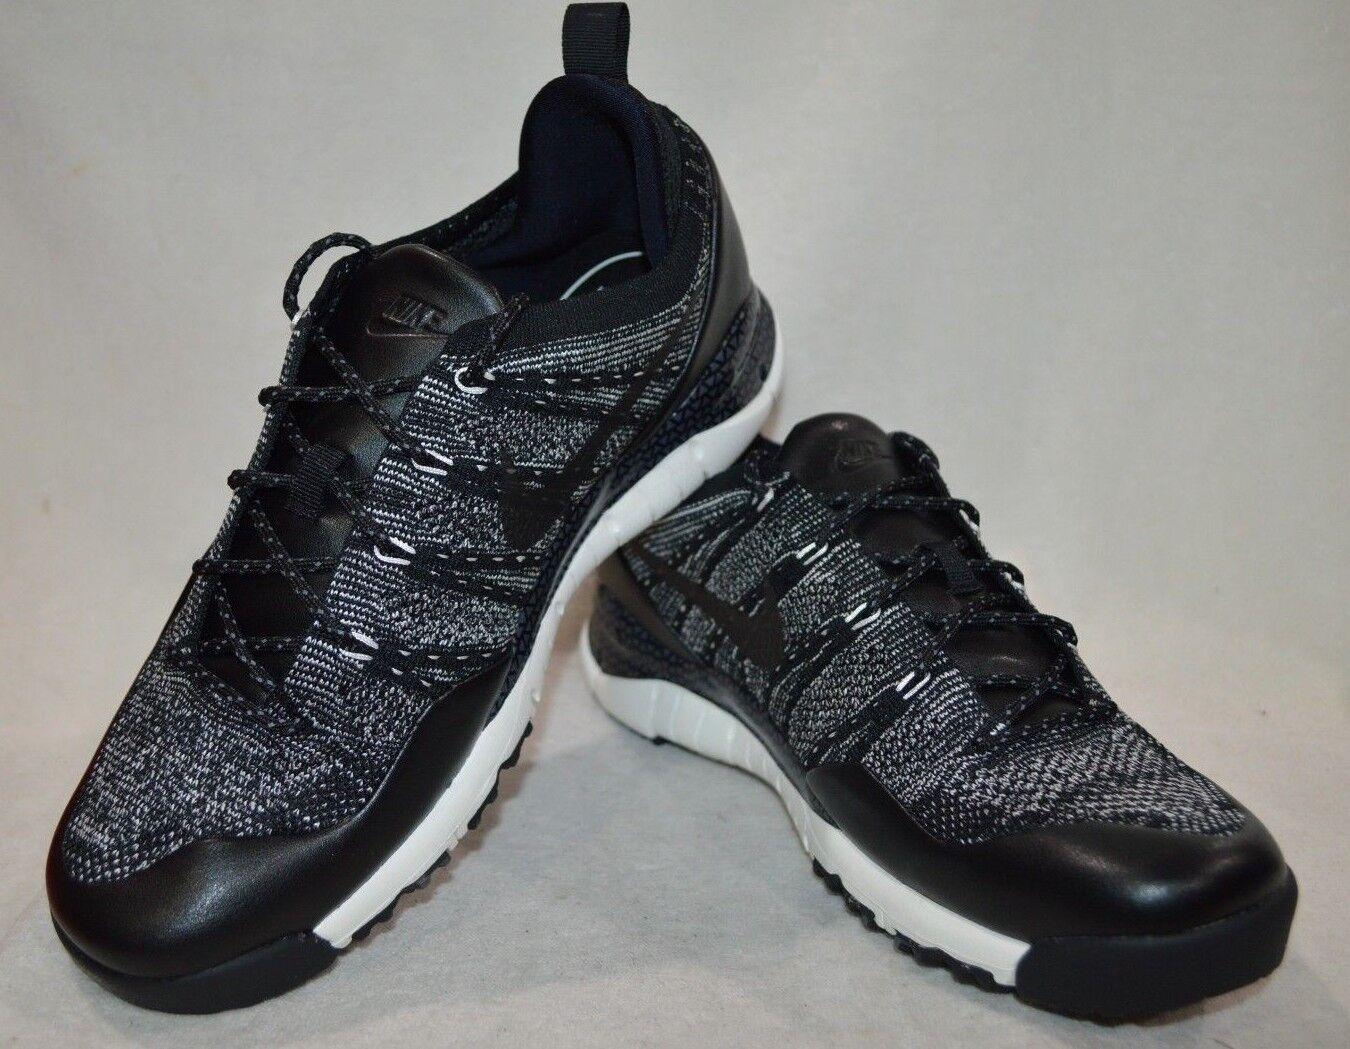 Nike Lupinek /Anthracite Flyknit Low Sail/ Noir /Anthracite Lupinek Sneaker-Asst 35892a